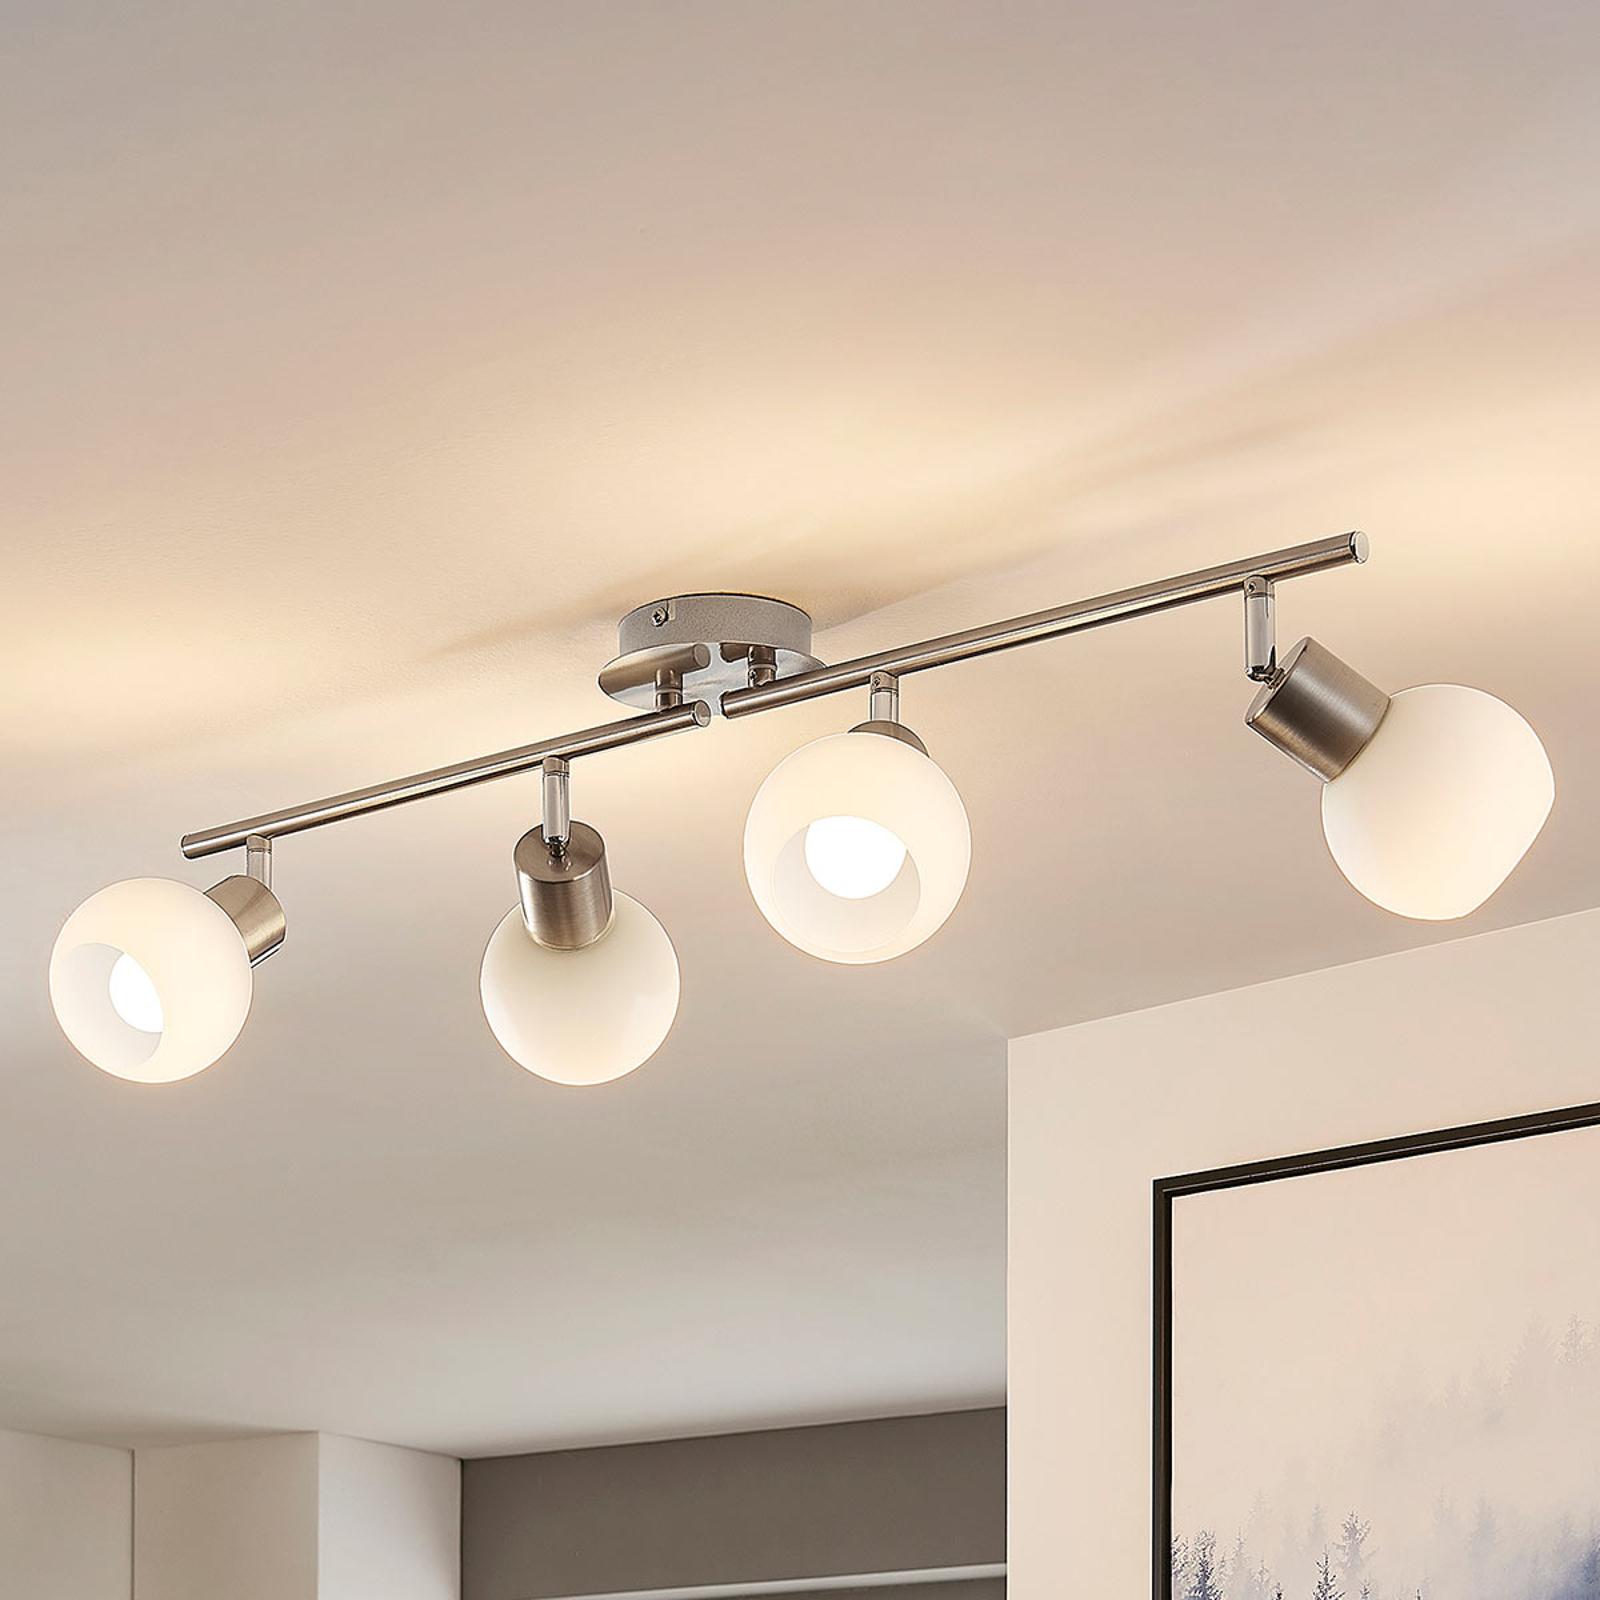 Wielopunktowa lampa sufitowa LED ELAINA, nikiel